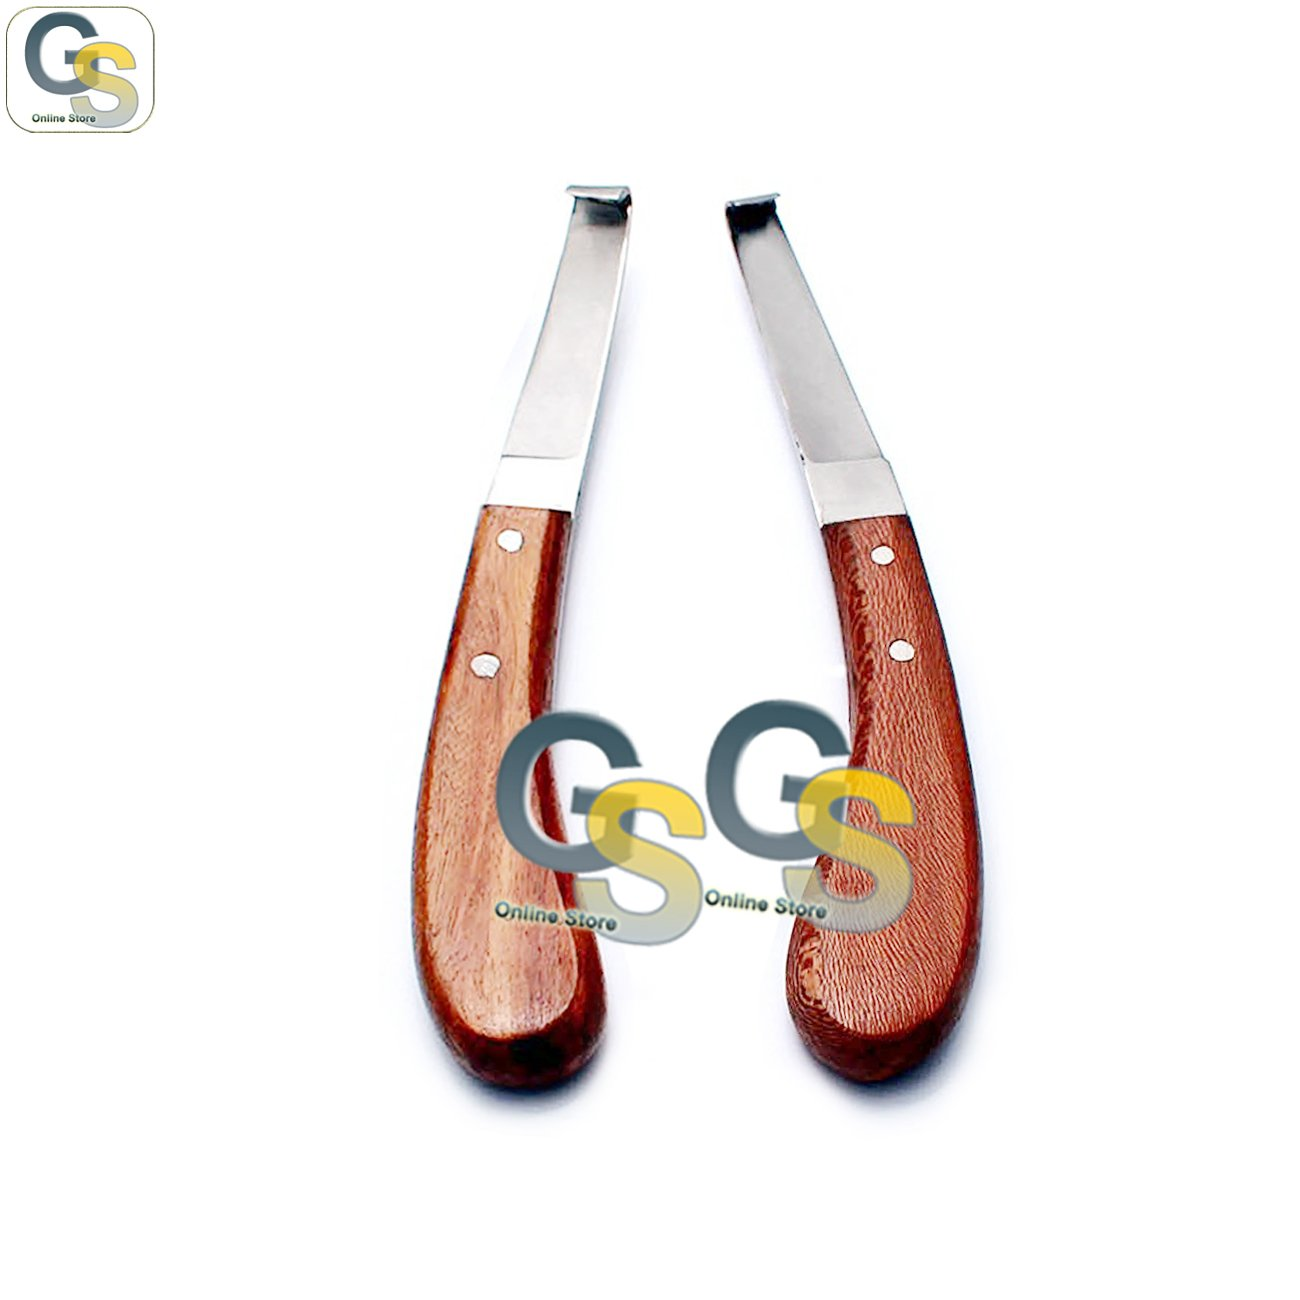 G.S HOOF KNIFE VETERINARY LEFT & RIGHT HANDED WOODEN HANDLE STAINLESS STEEL BLADE